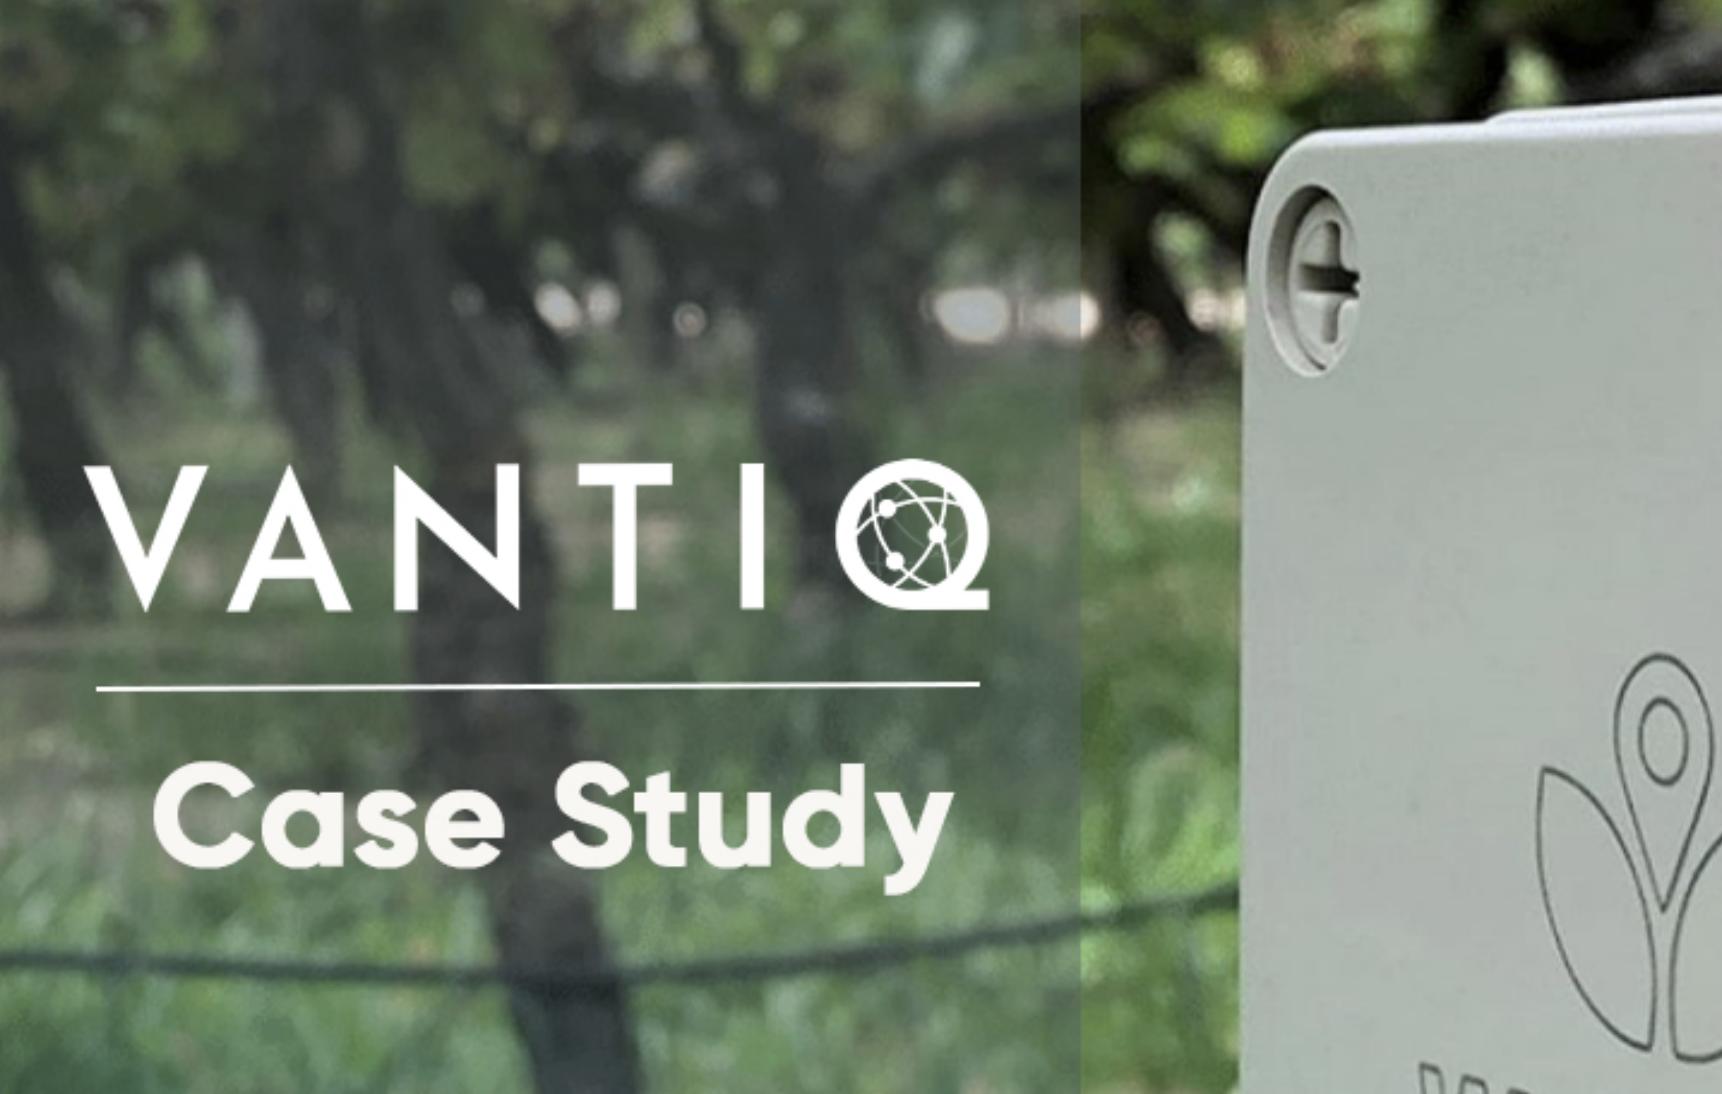 vantiq waterbit case study banner